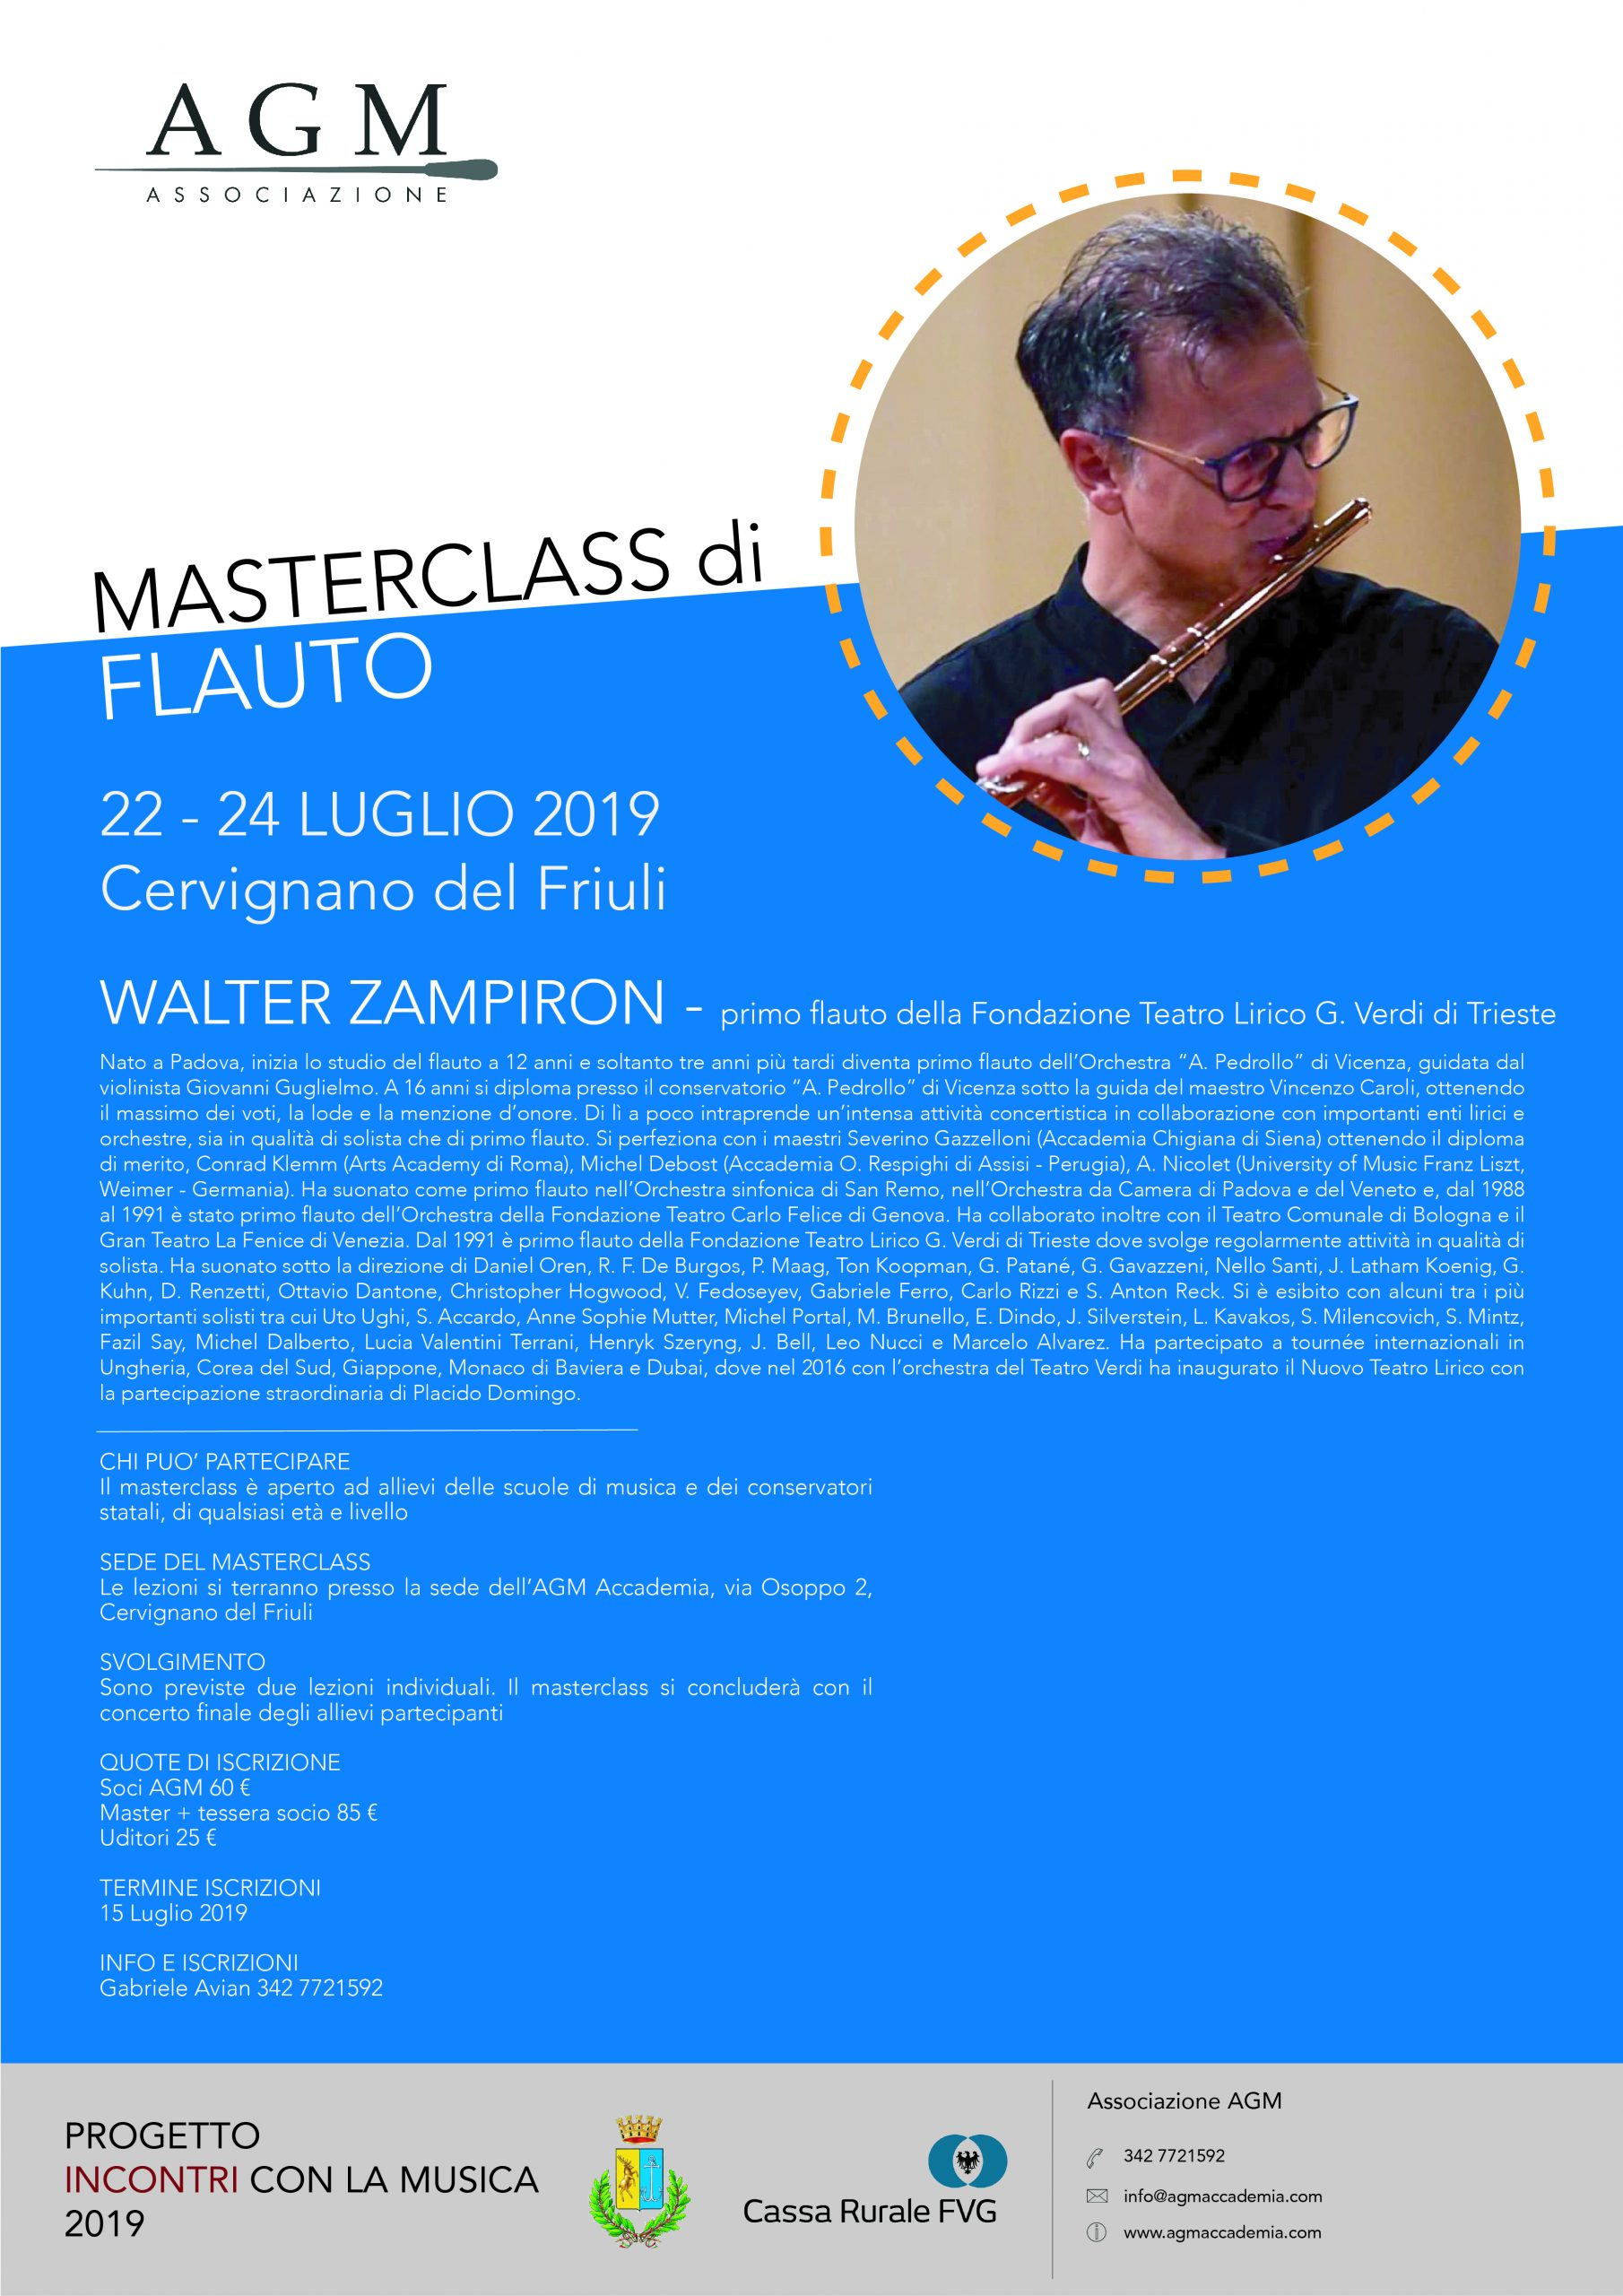 master flauto 2019 Walter Zampiron